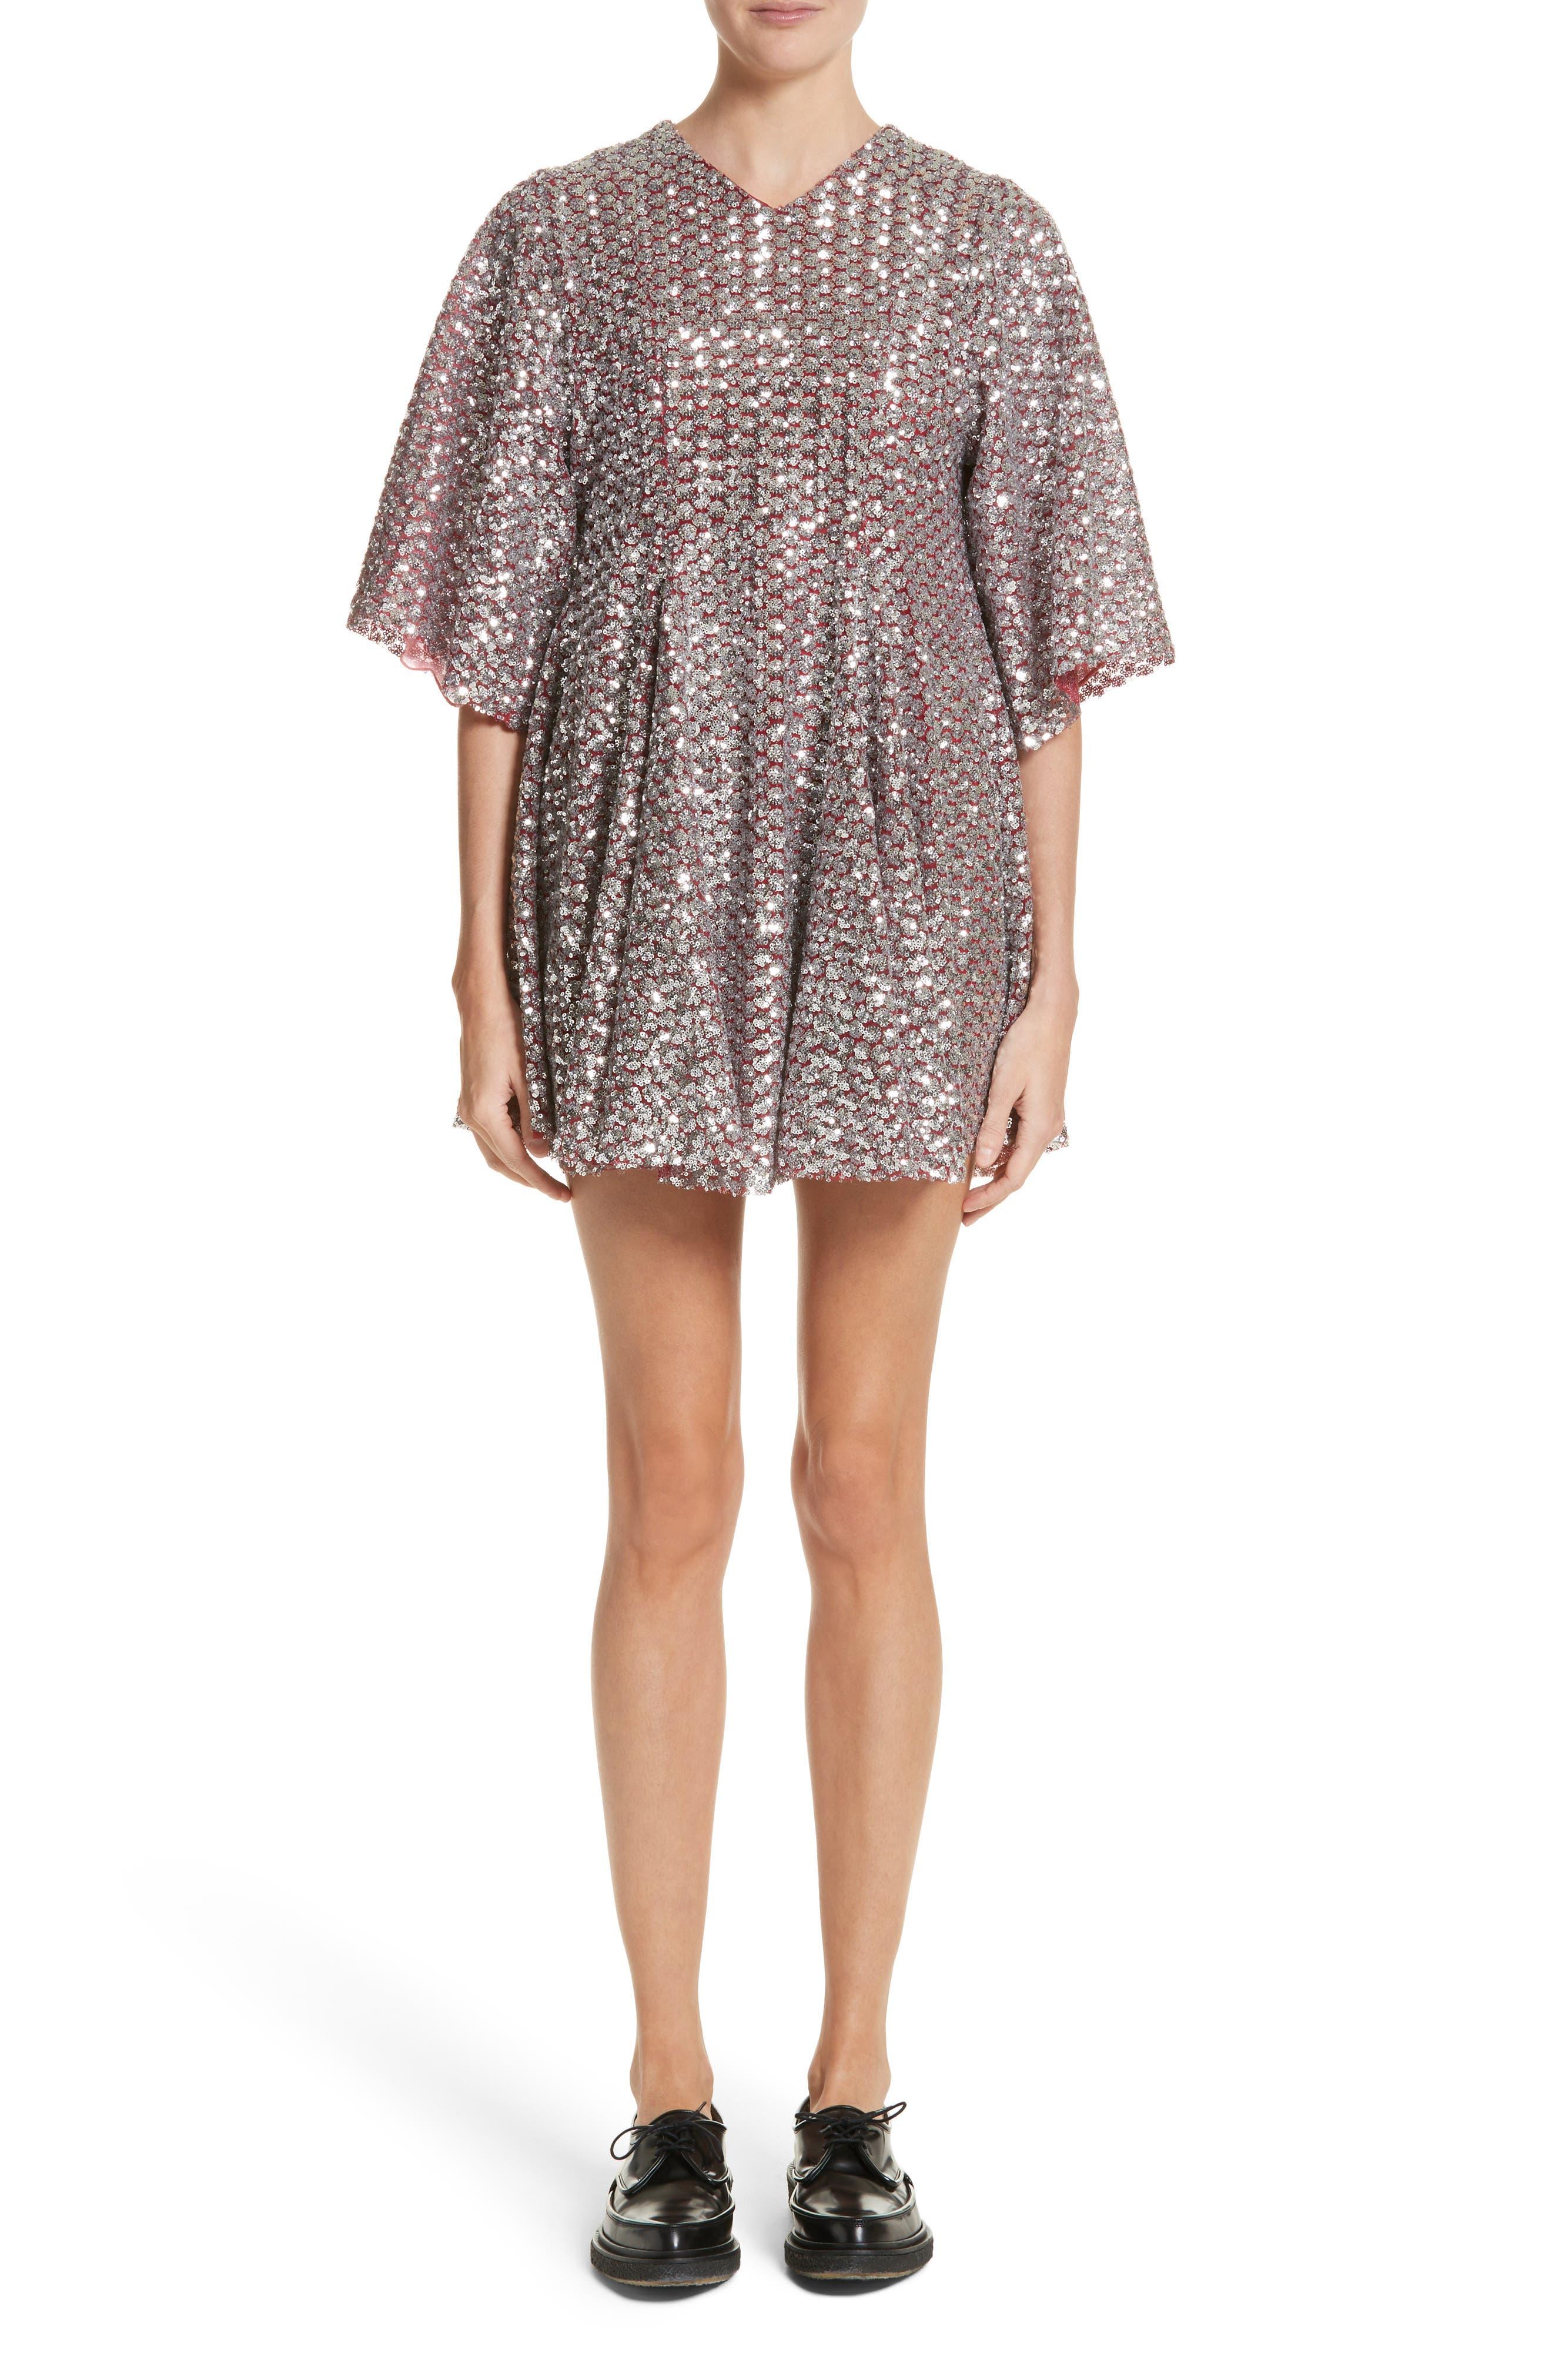 Molly Goddard Simmi Sequin Dress